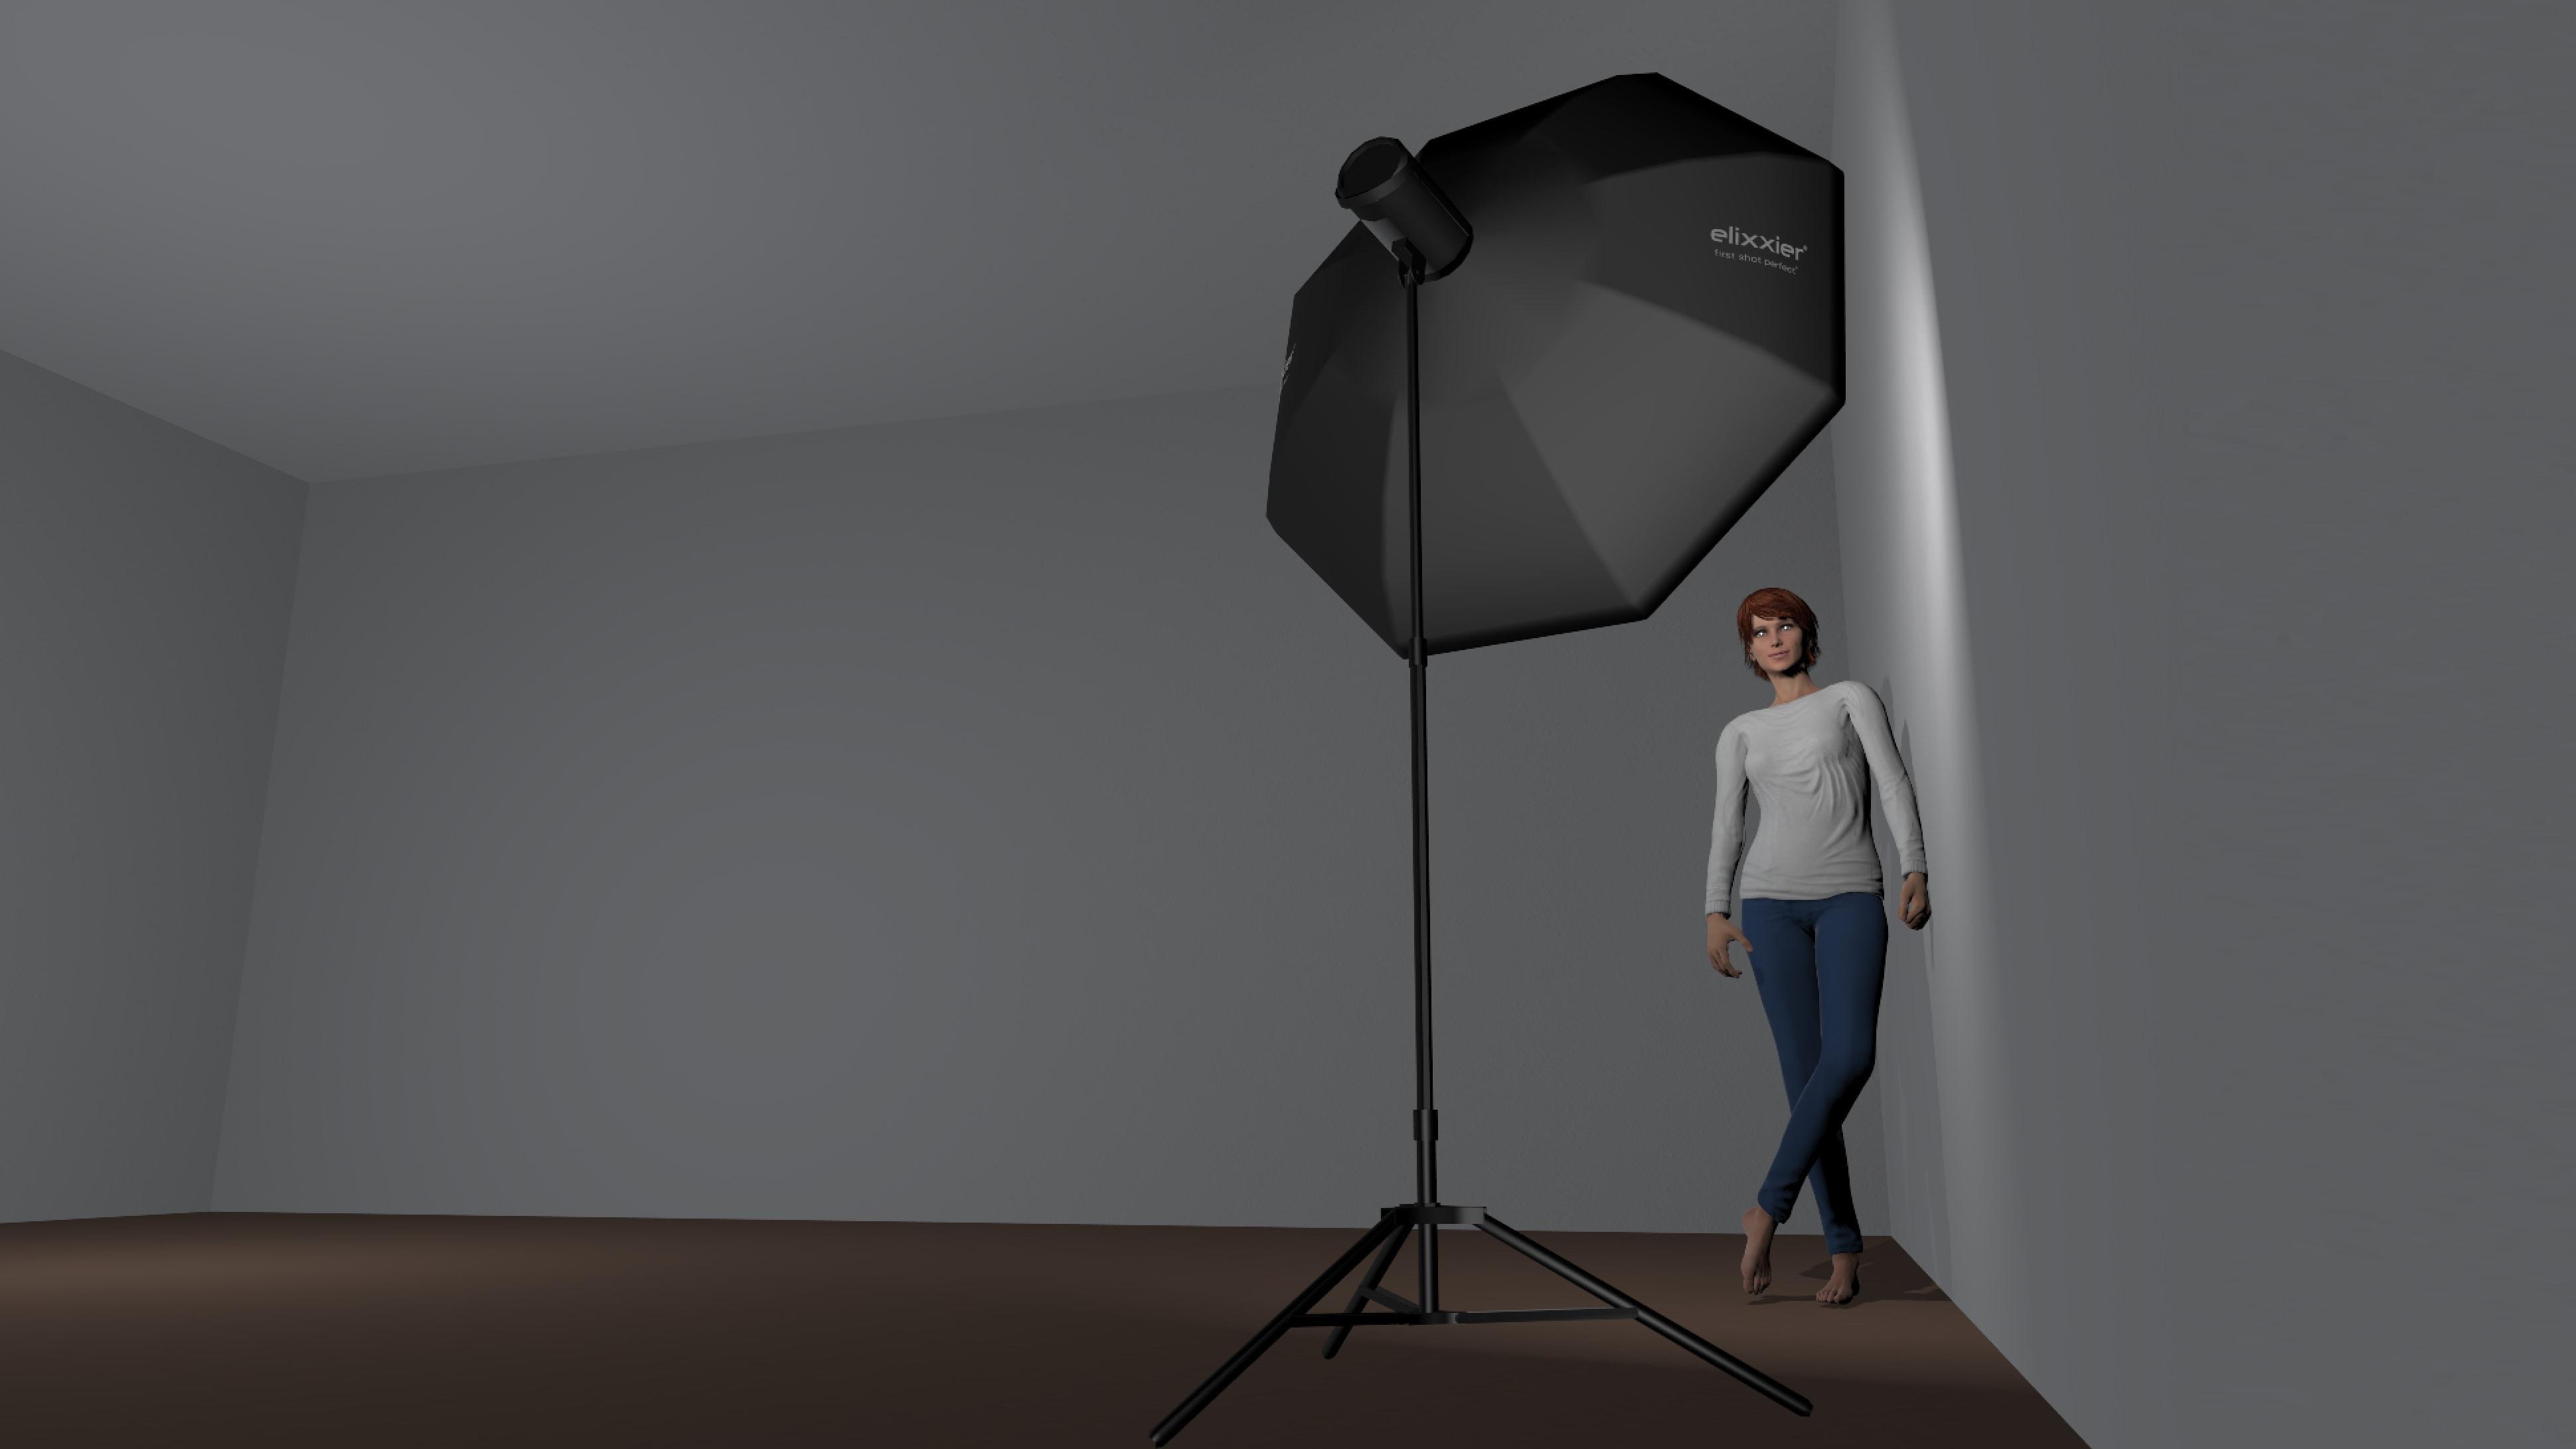 Casual portrait Lighting Setup One